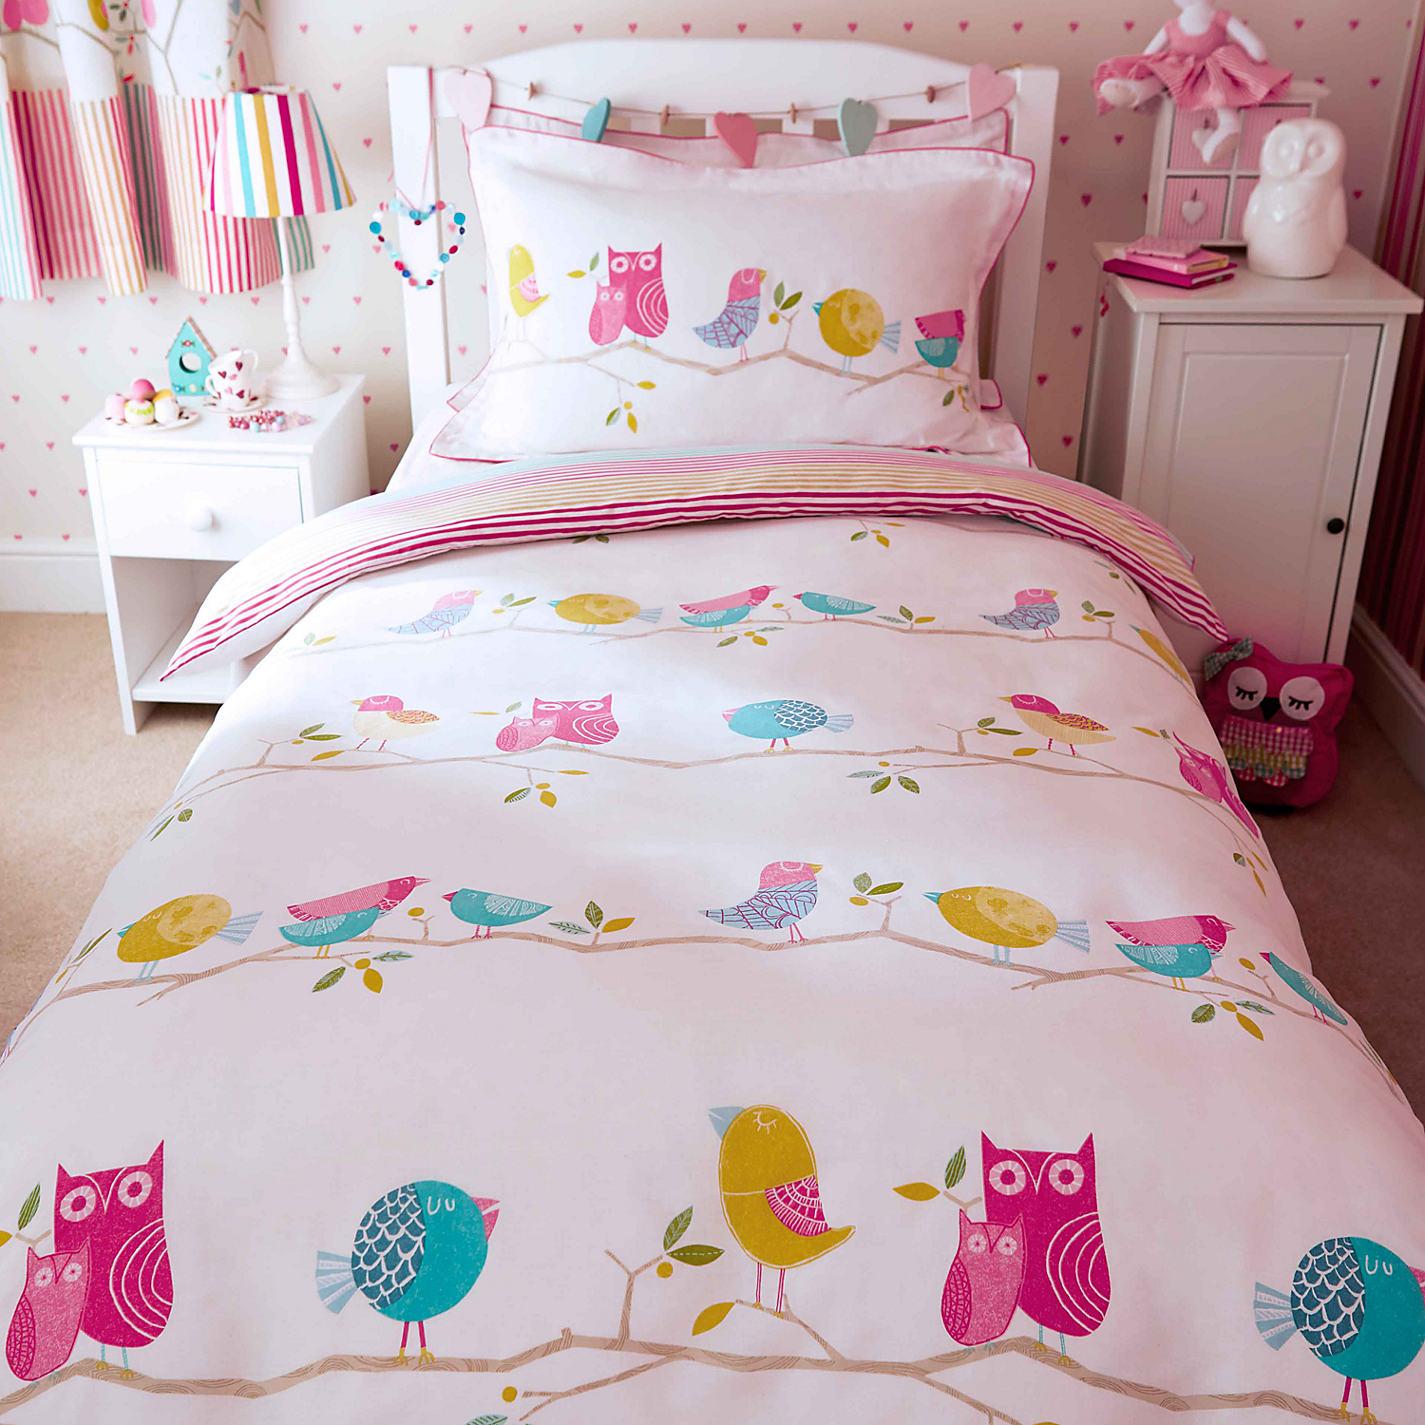 John lewis childrens bedroom furniture - John Lewis Childrens Bedroom Furniture Piazzesi Us